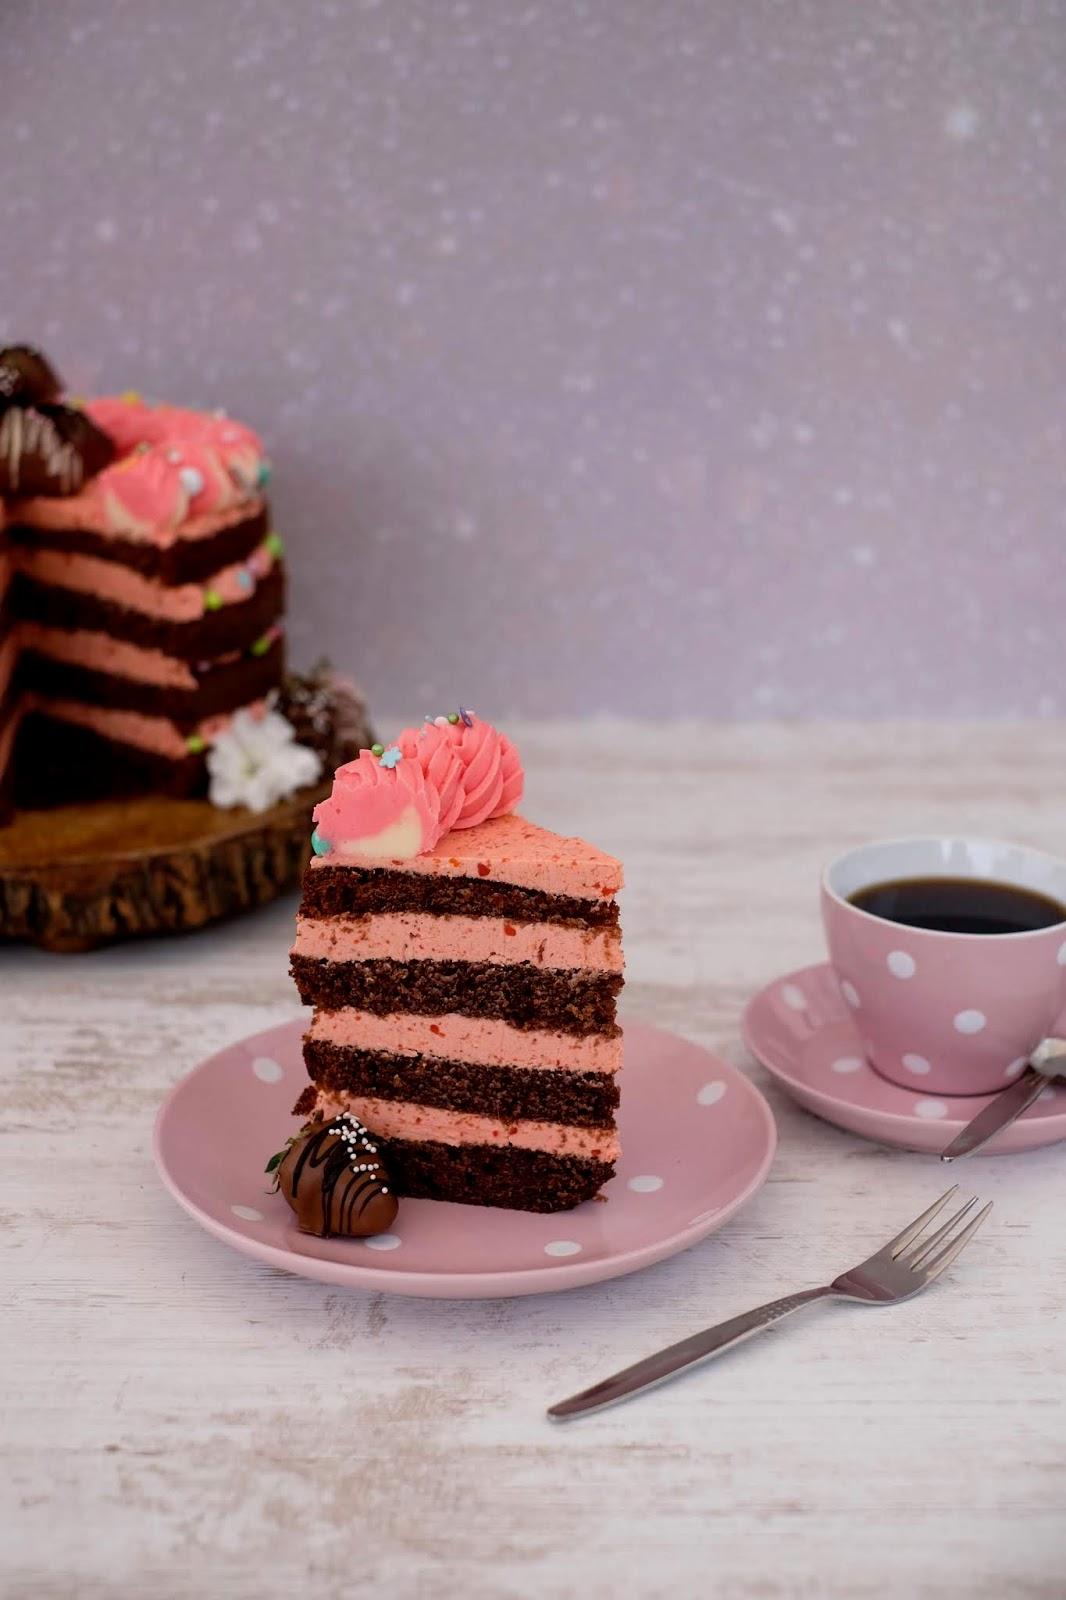 Schoko Erdbeer Naked Cake   Marion&39;s Kaffeeklatsch